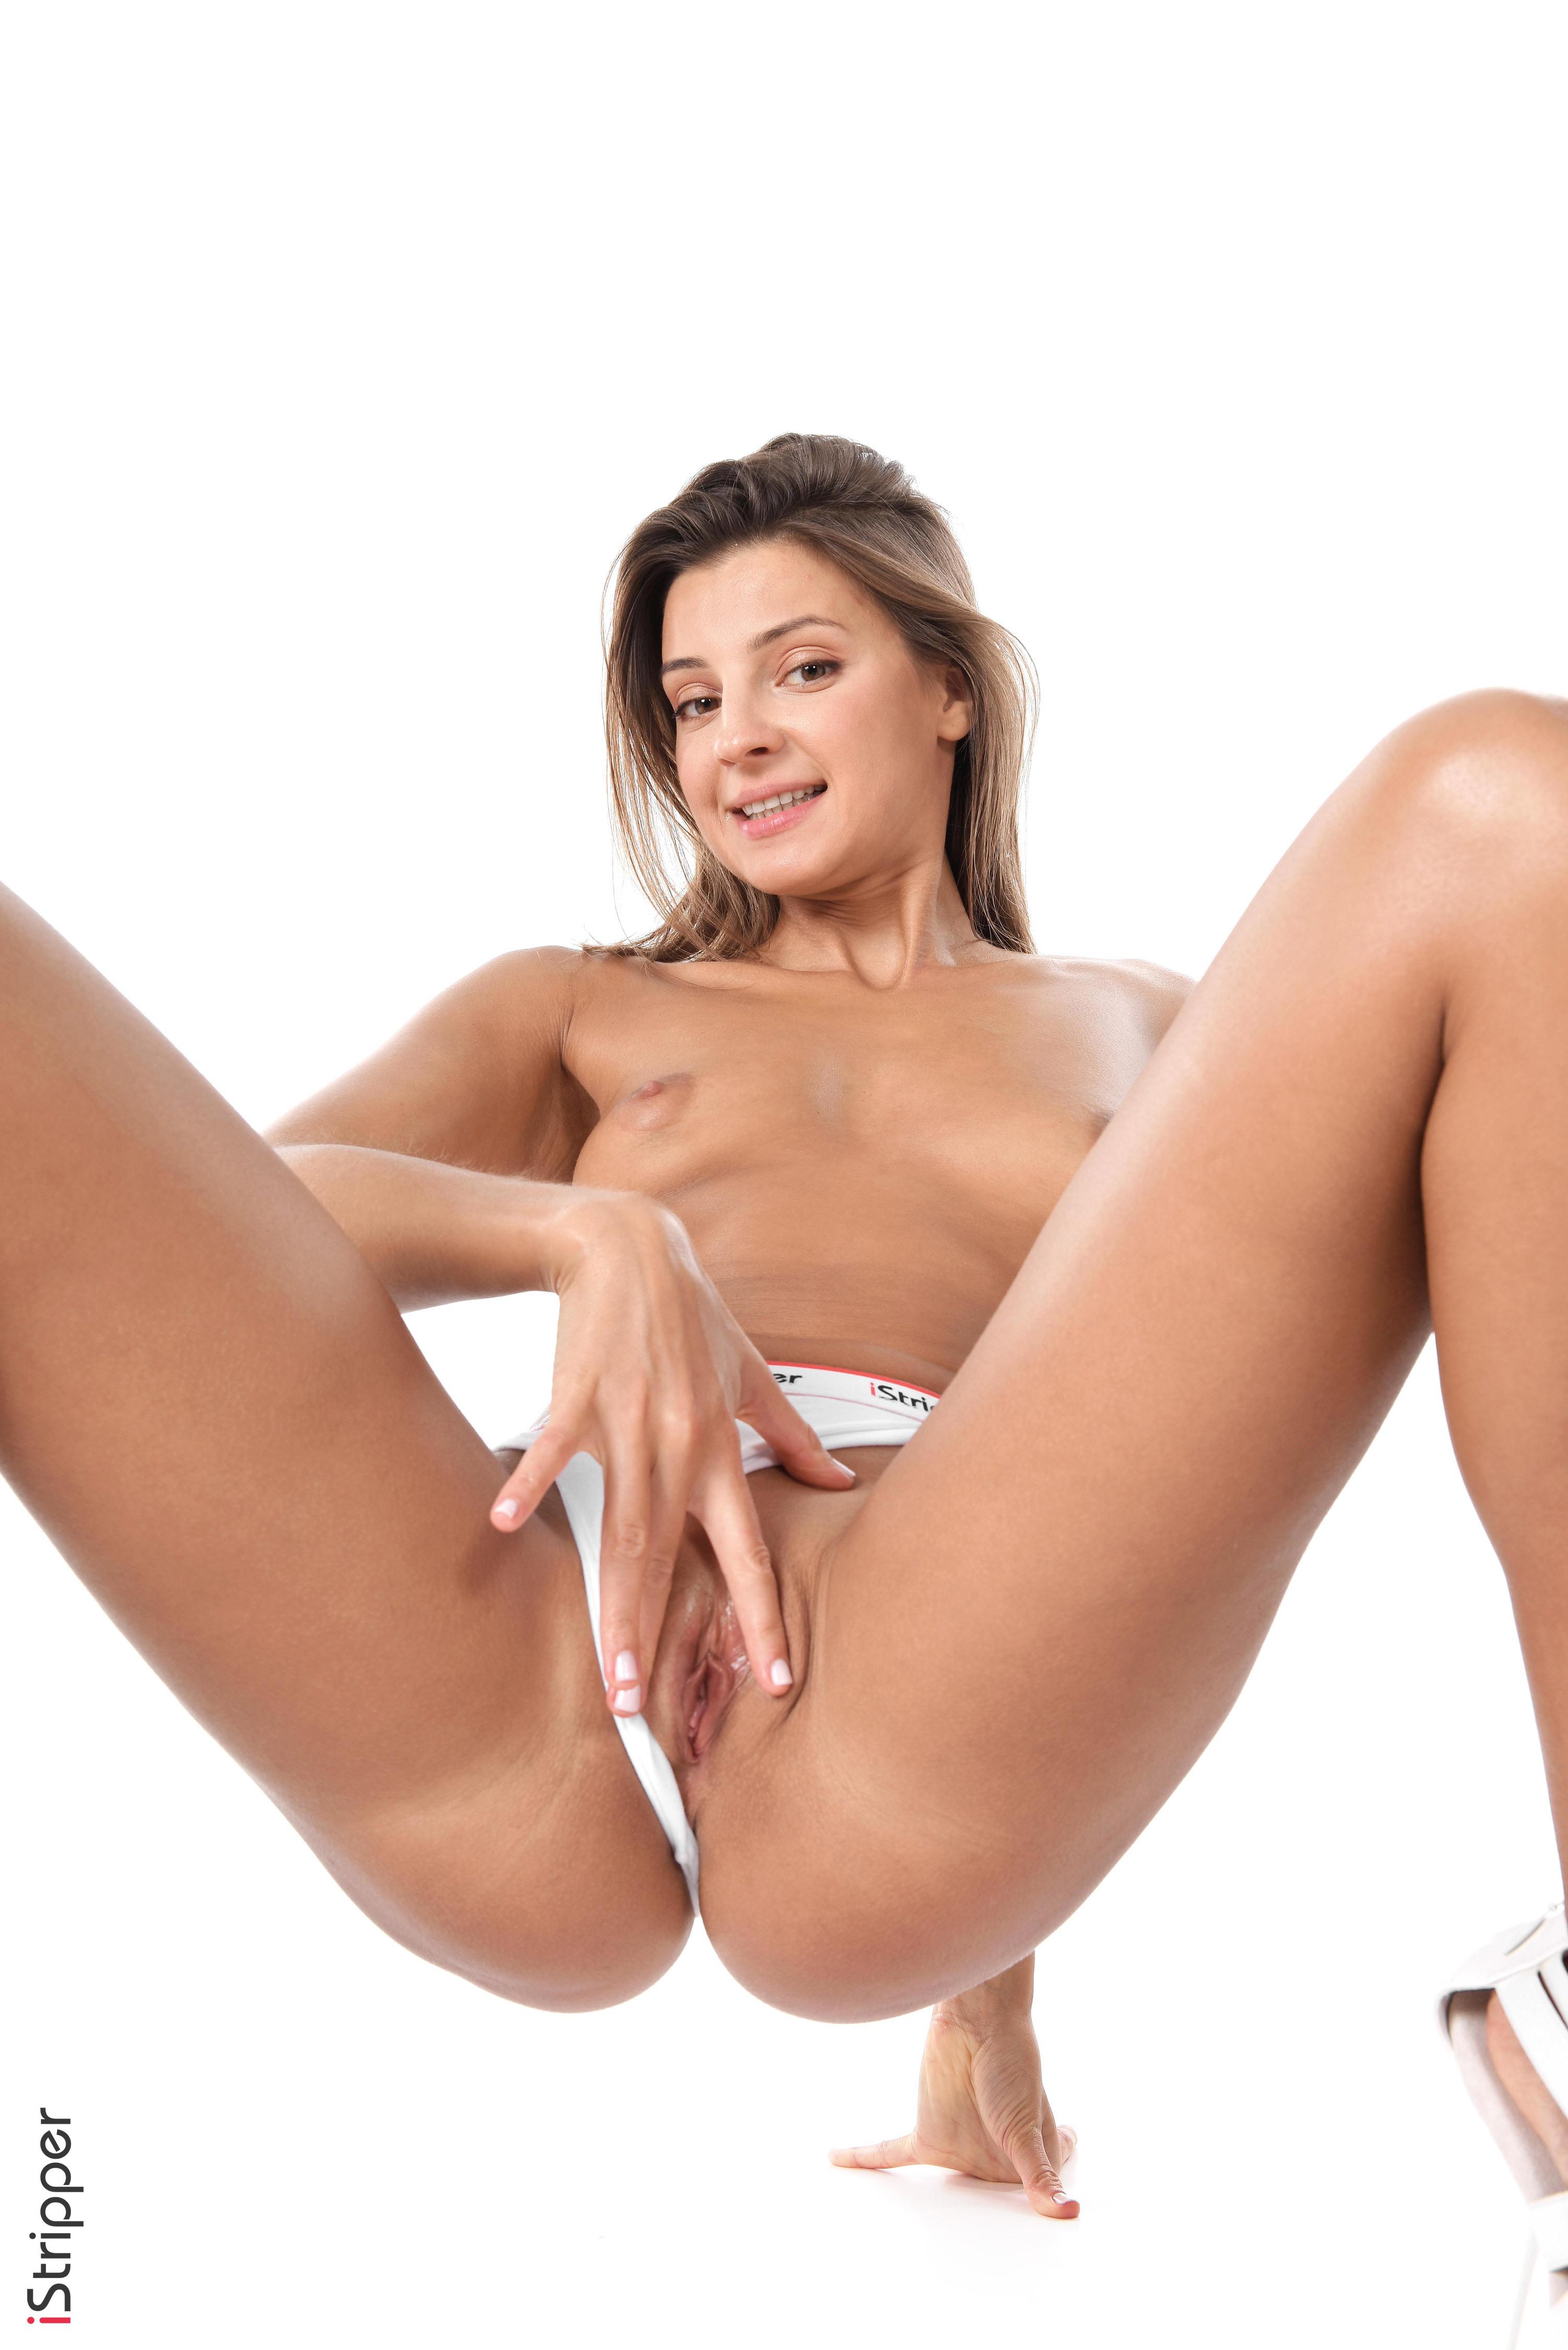 hot sexy Bare wallpaper